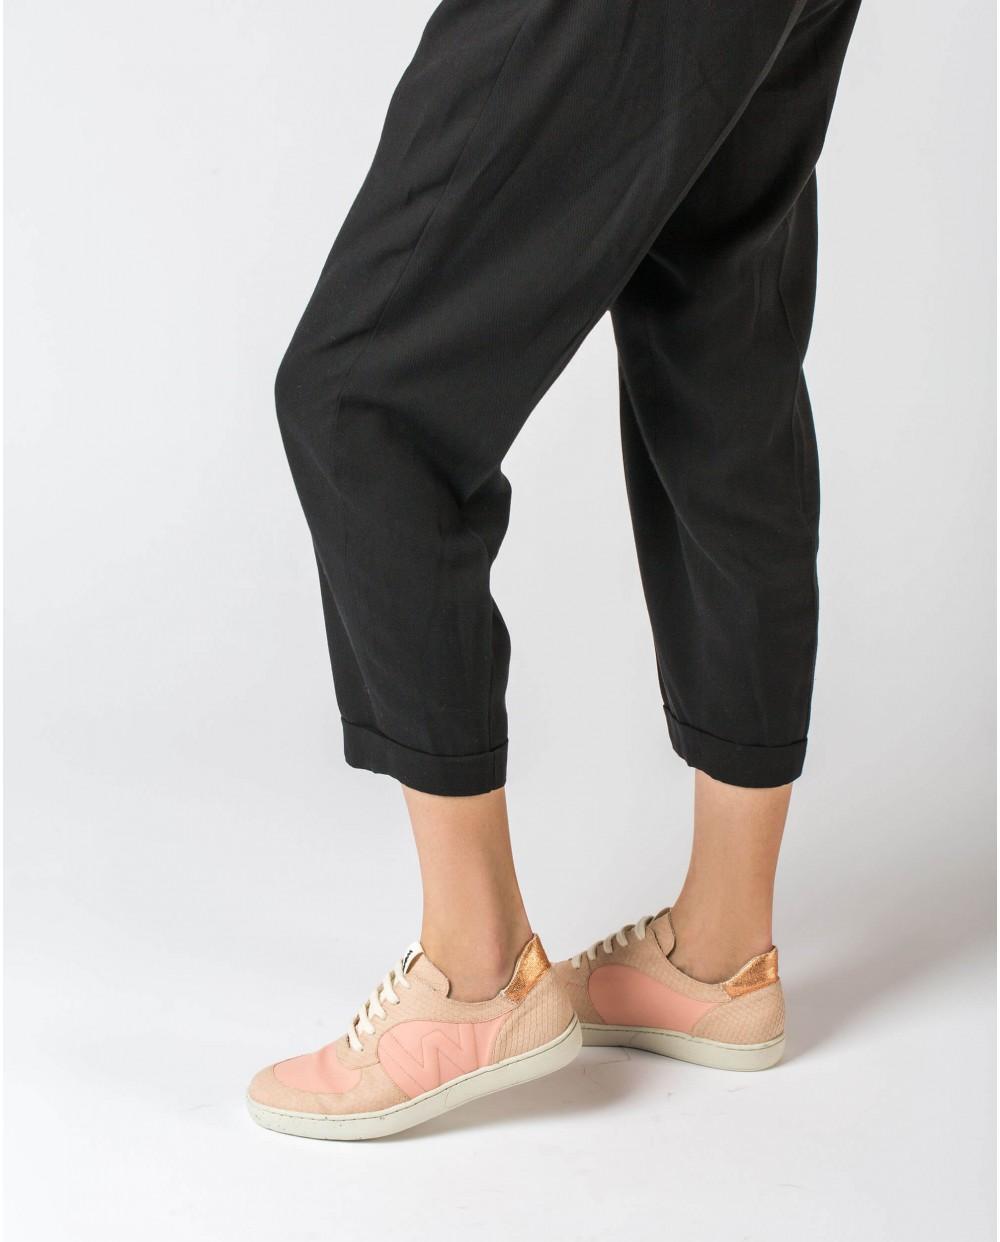 Wonders-Zapatos planos-OLMO